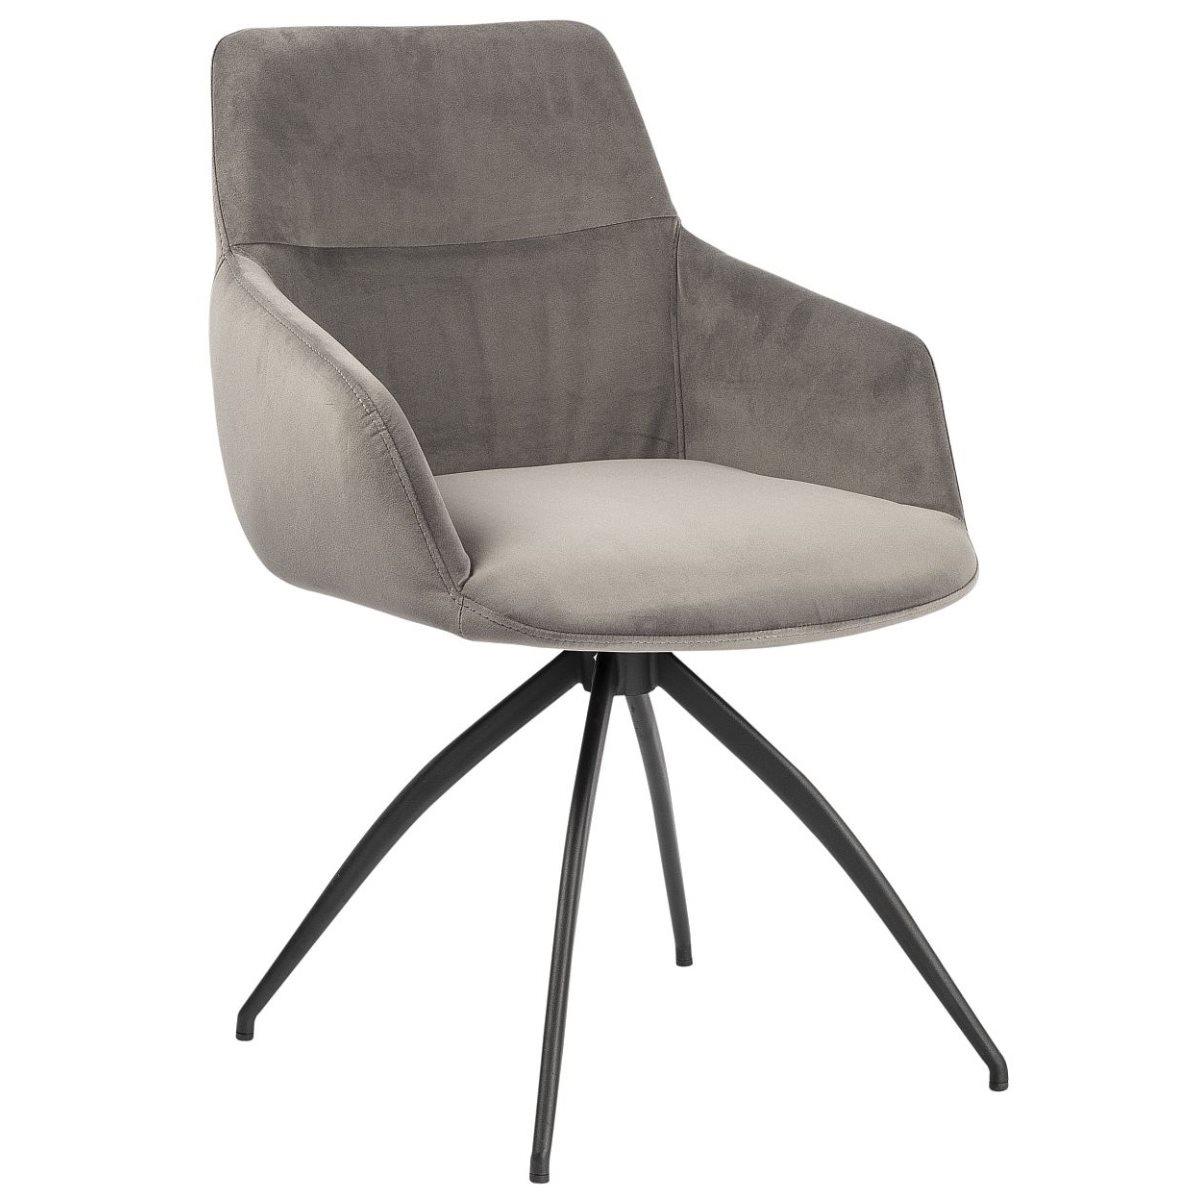 Gray fabric dining room chair modern cheap design